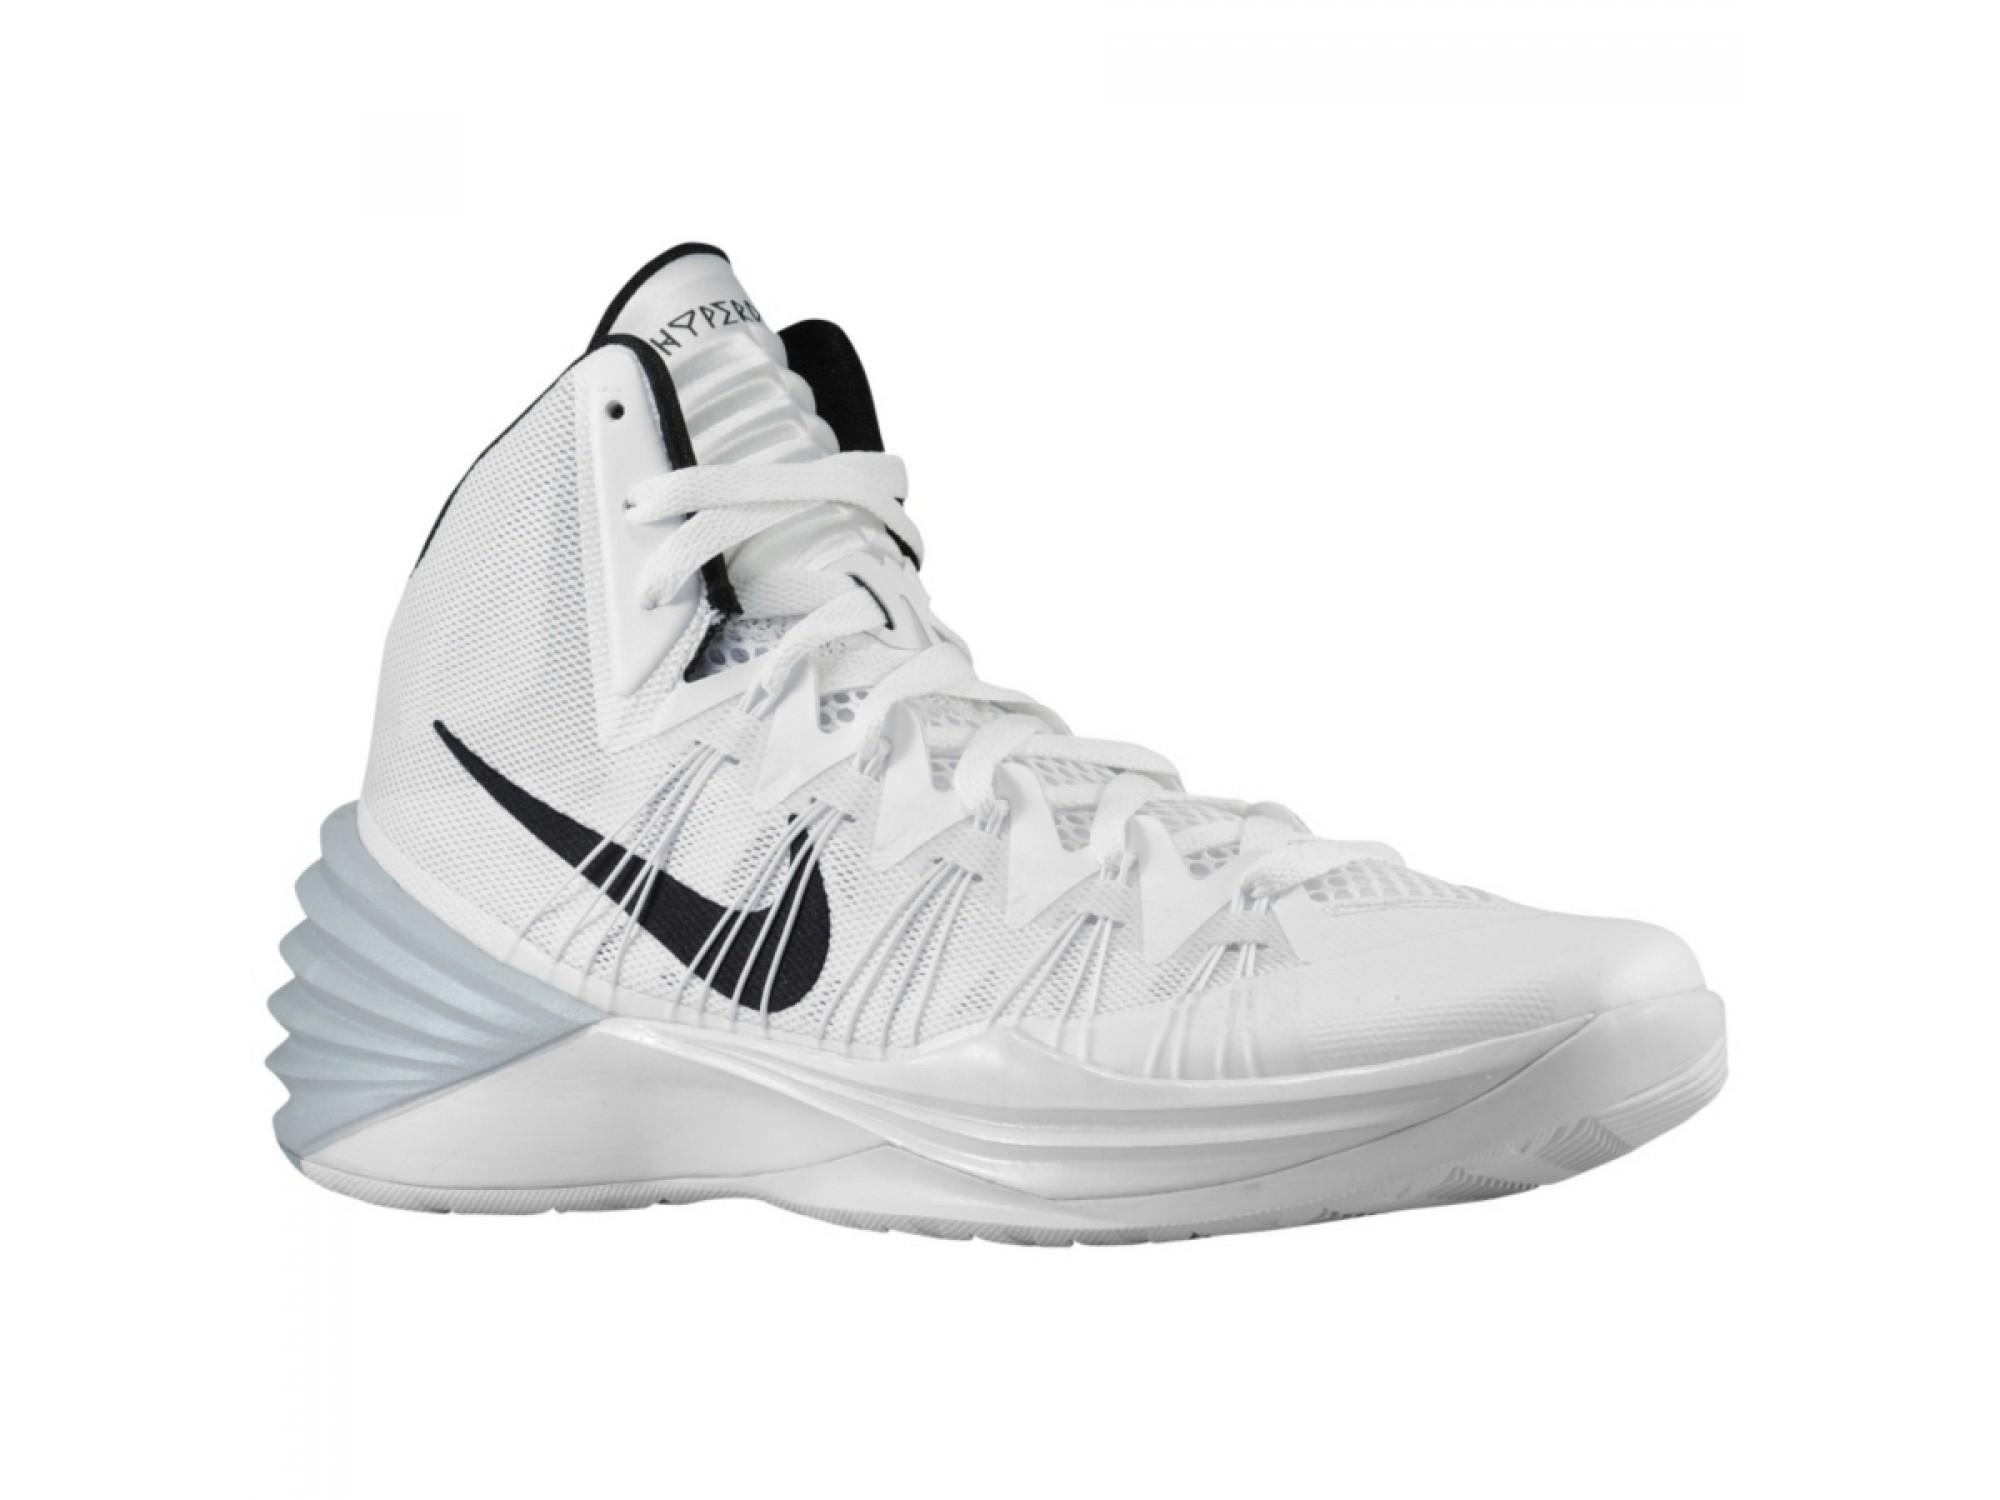 Nike Hyperdunk 2013 (White/ Black) - купить в Украине ...